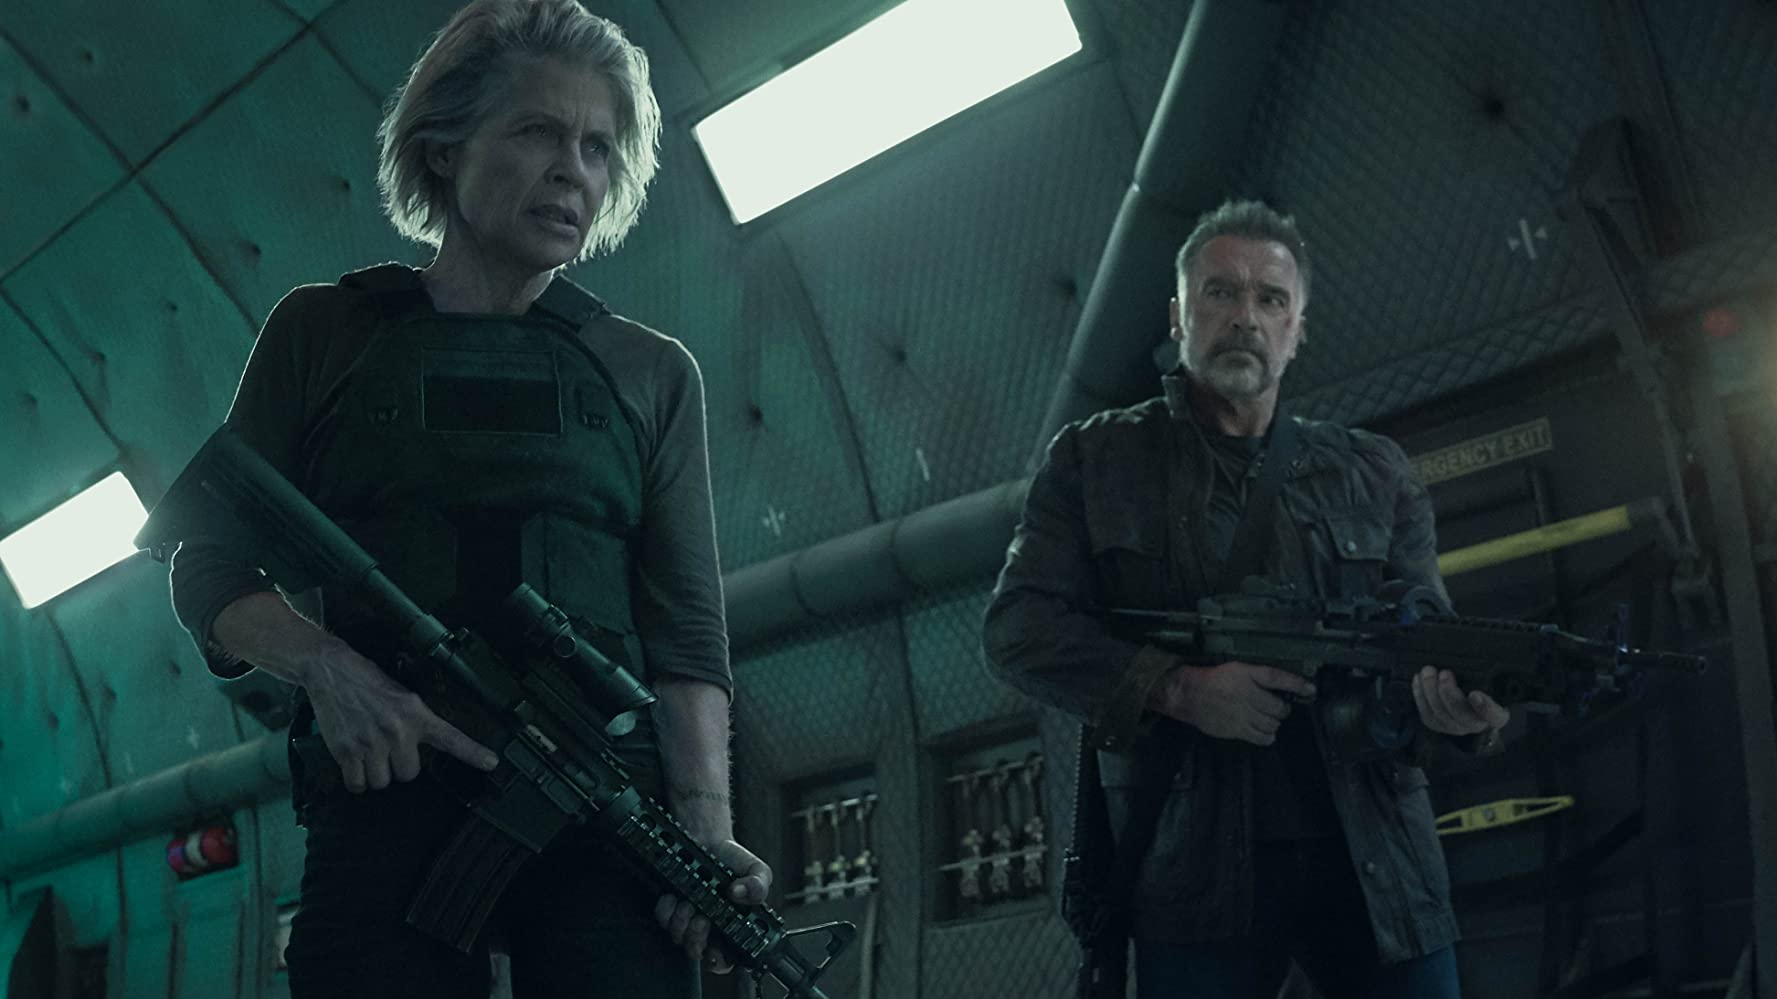 Linda Hamilton and Arnold Schwarzenegger in Terminator: Dark Fate (2019)